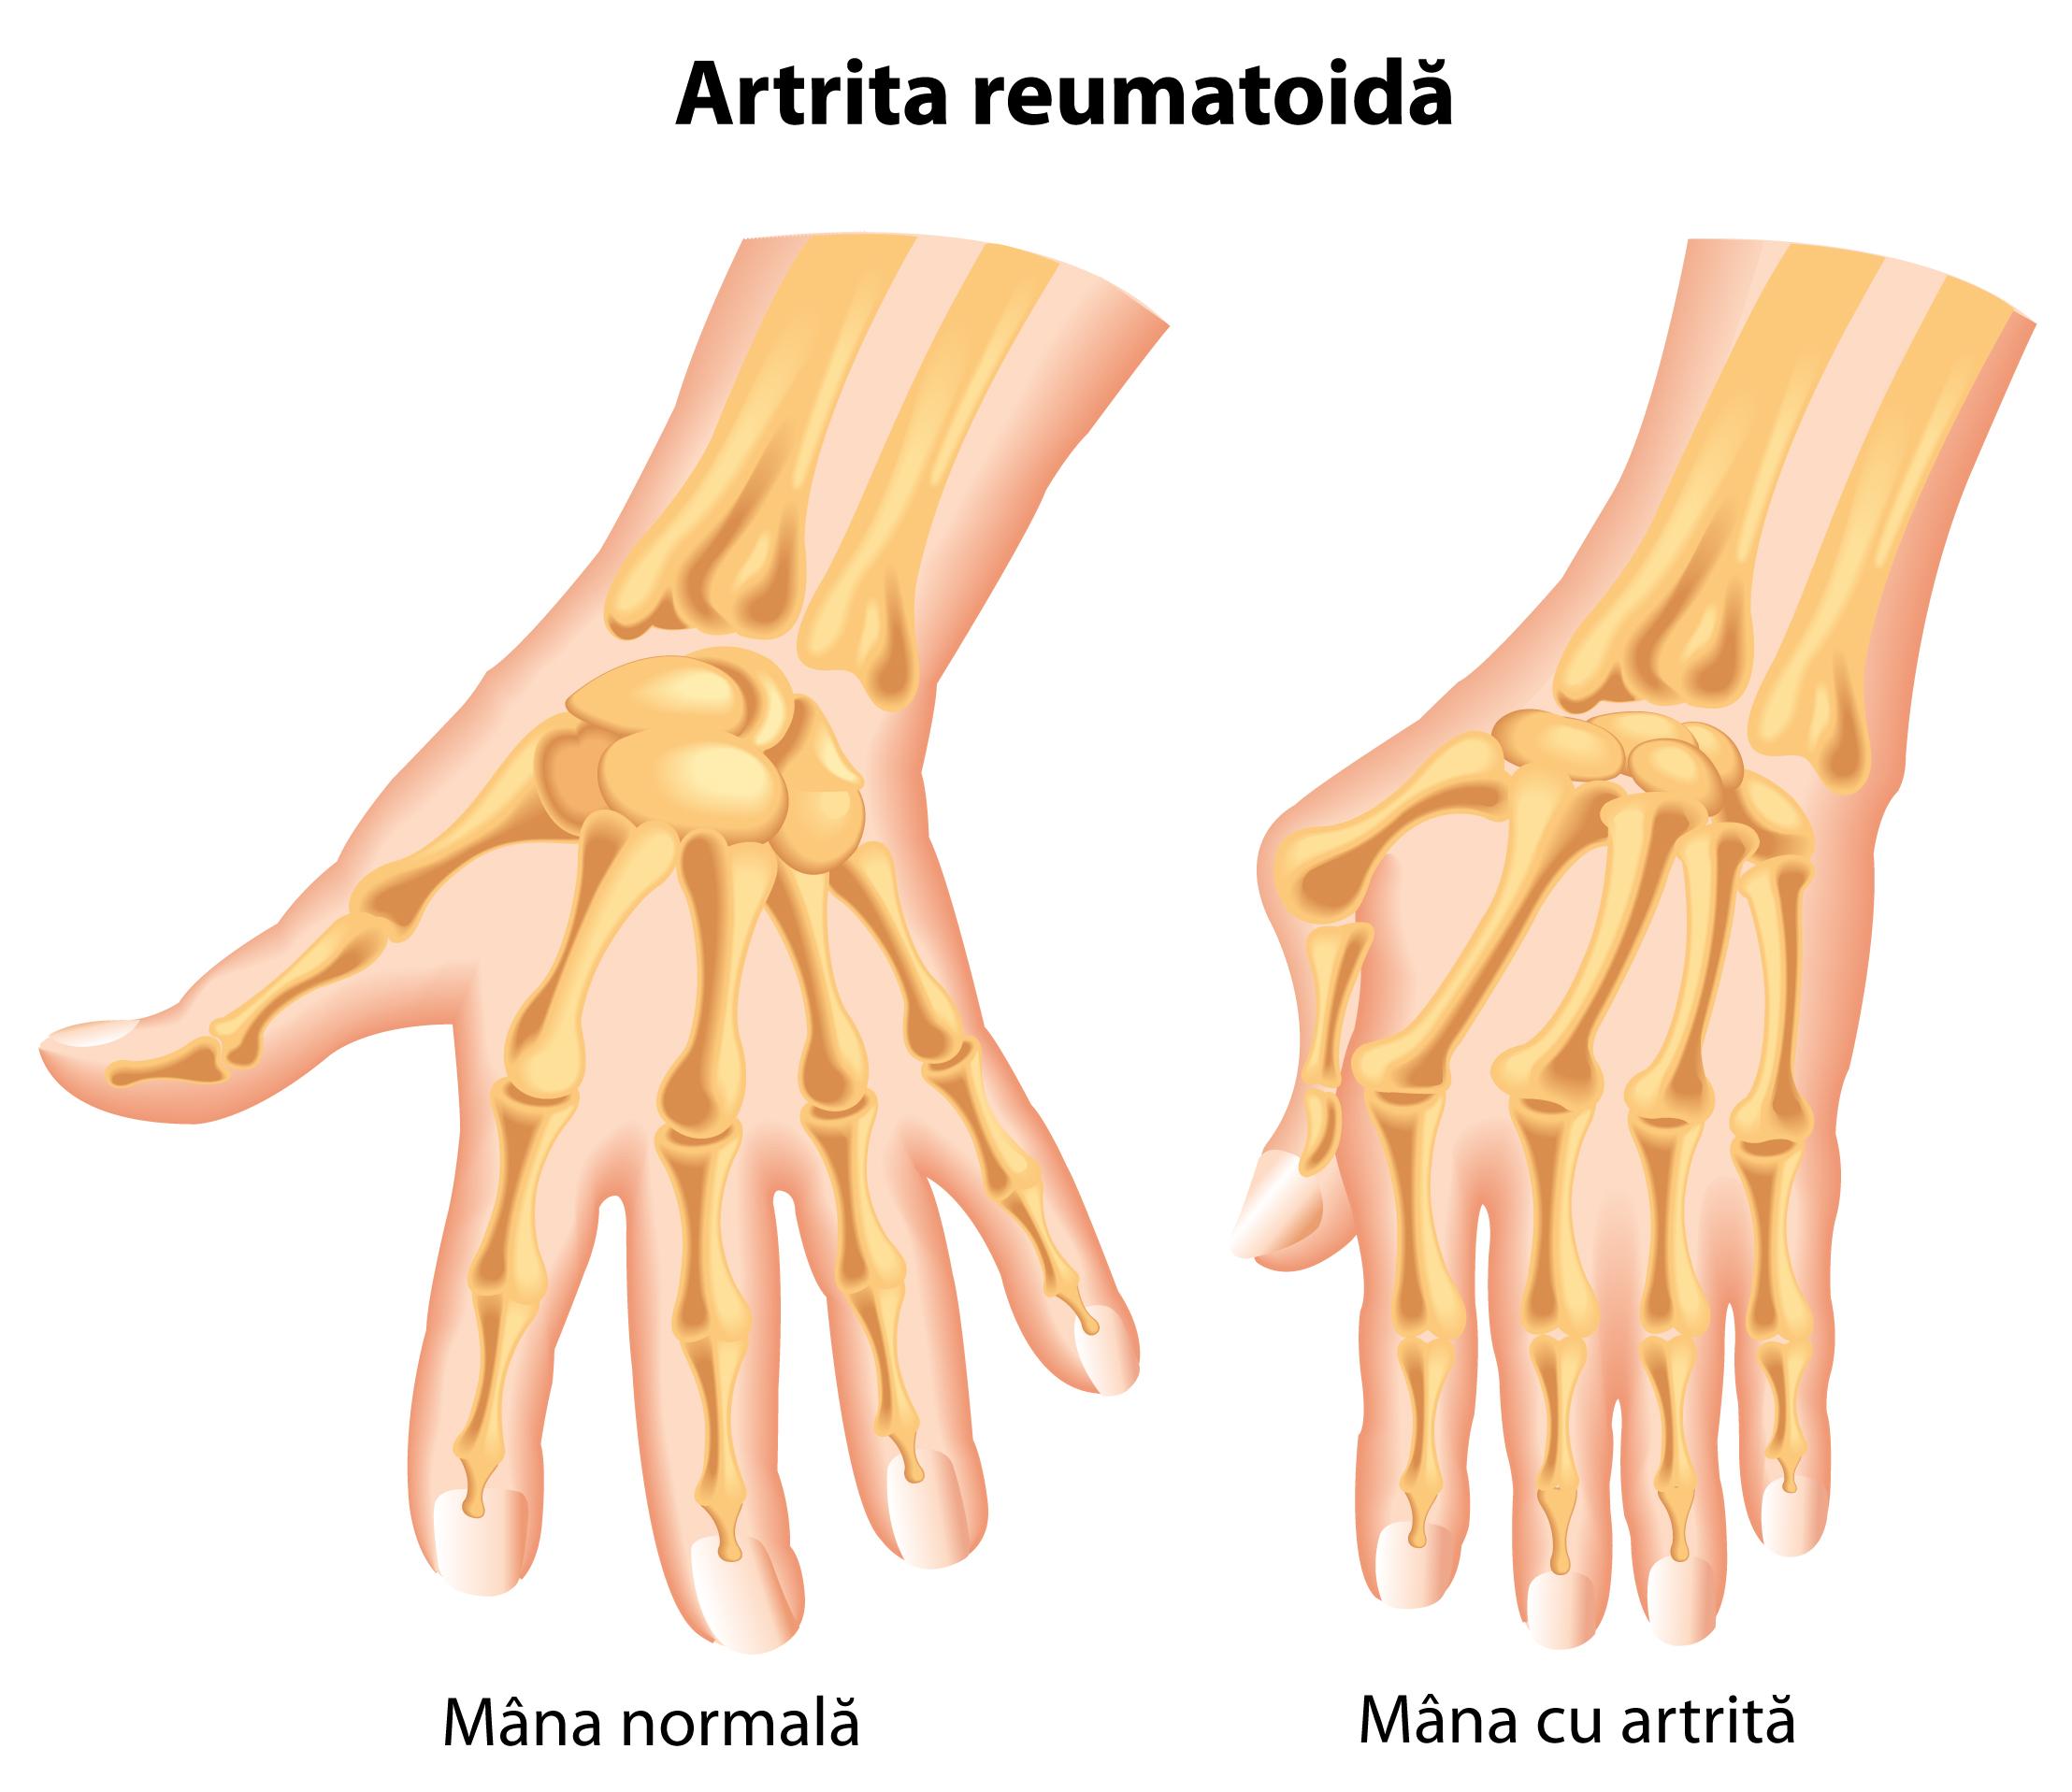 Poliartrita reumatoida | studioharry.ro